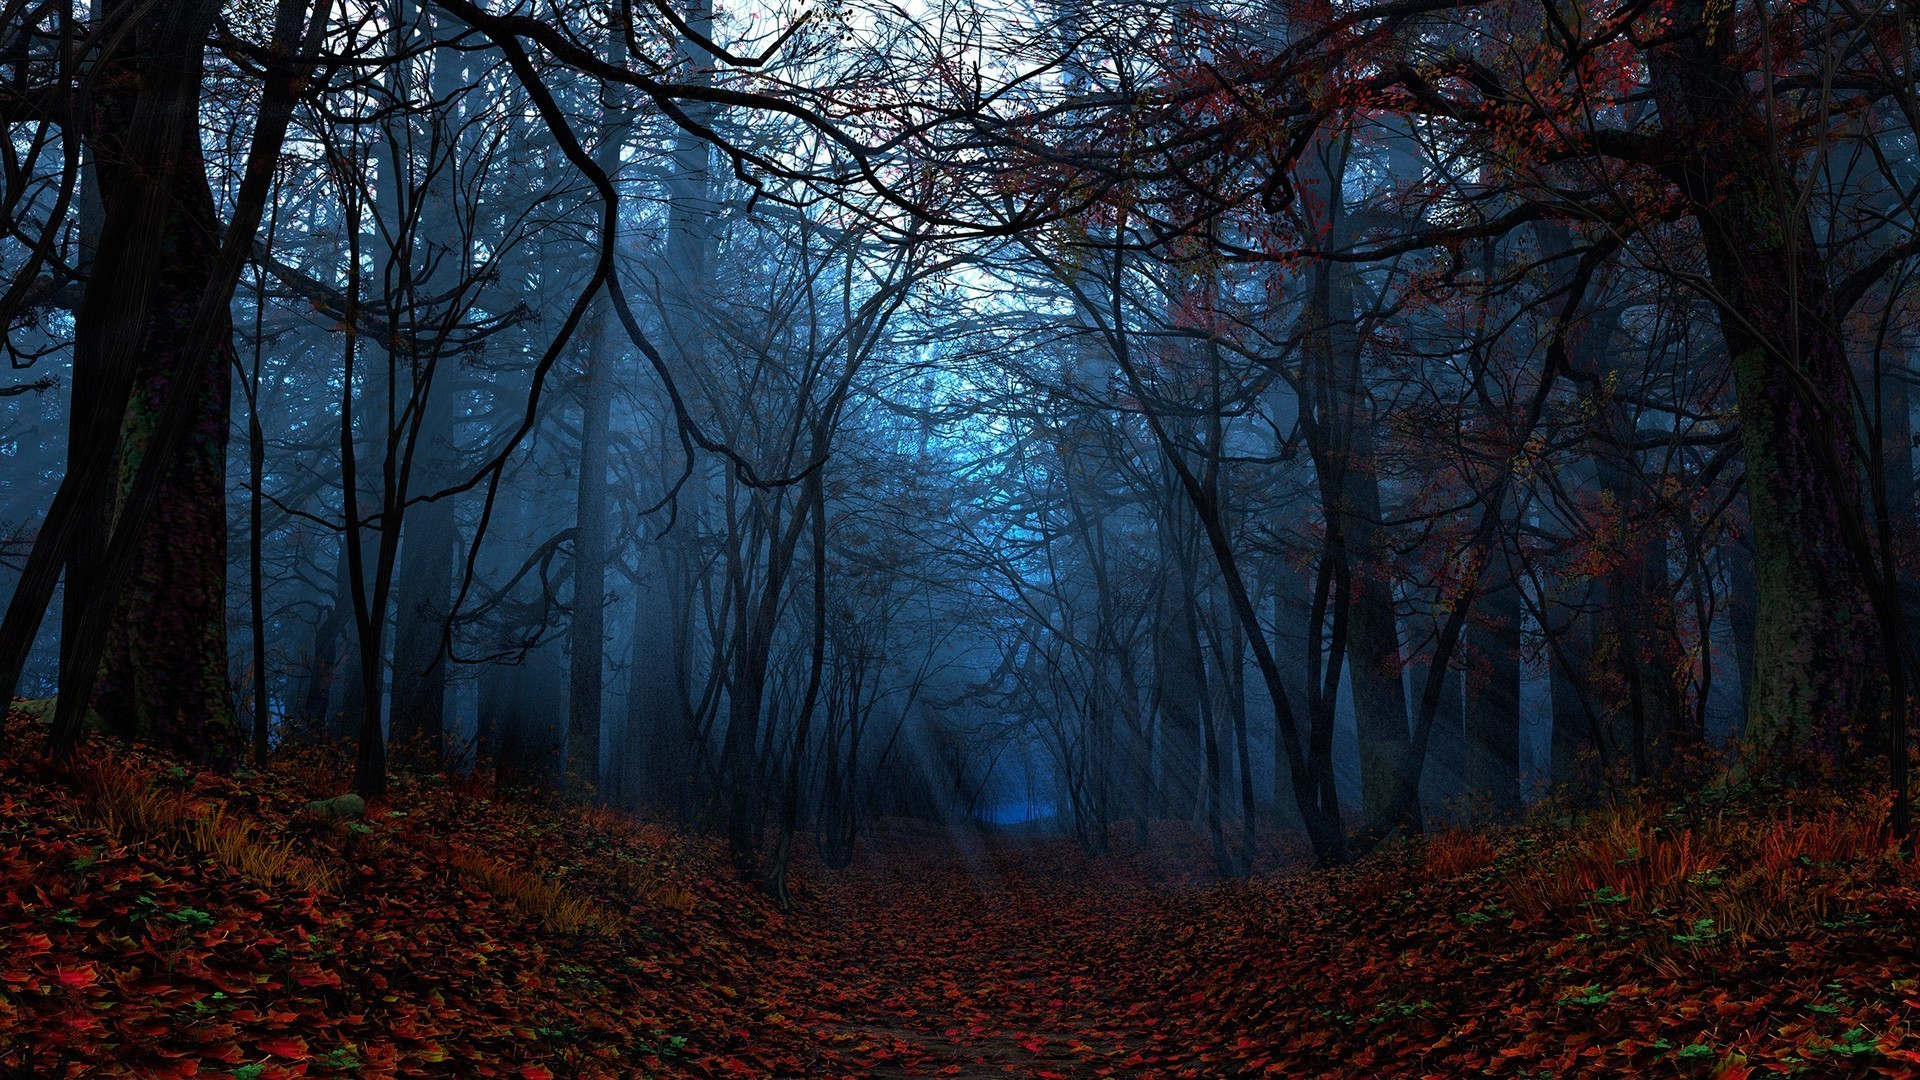 Autumn Forest Wallpaper Full Hd Dark Fall Wallpaper Hd 1920x1080 Download Hd Wallpaper Wallpapertip